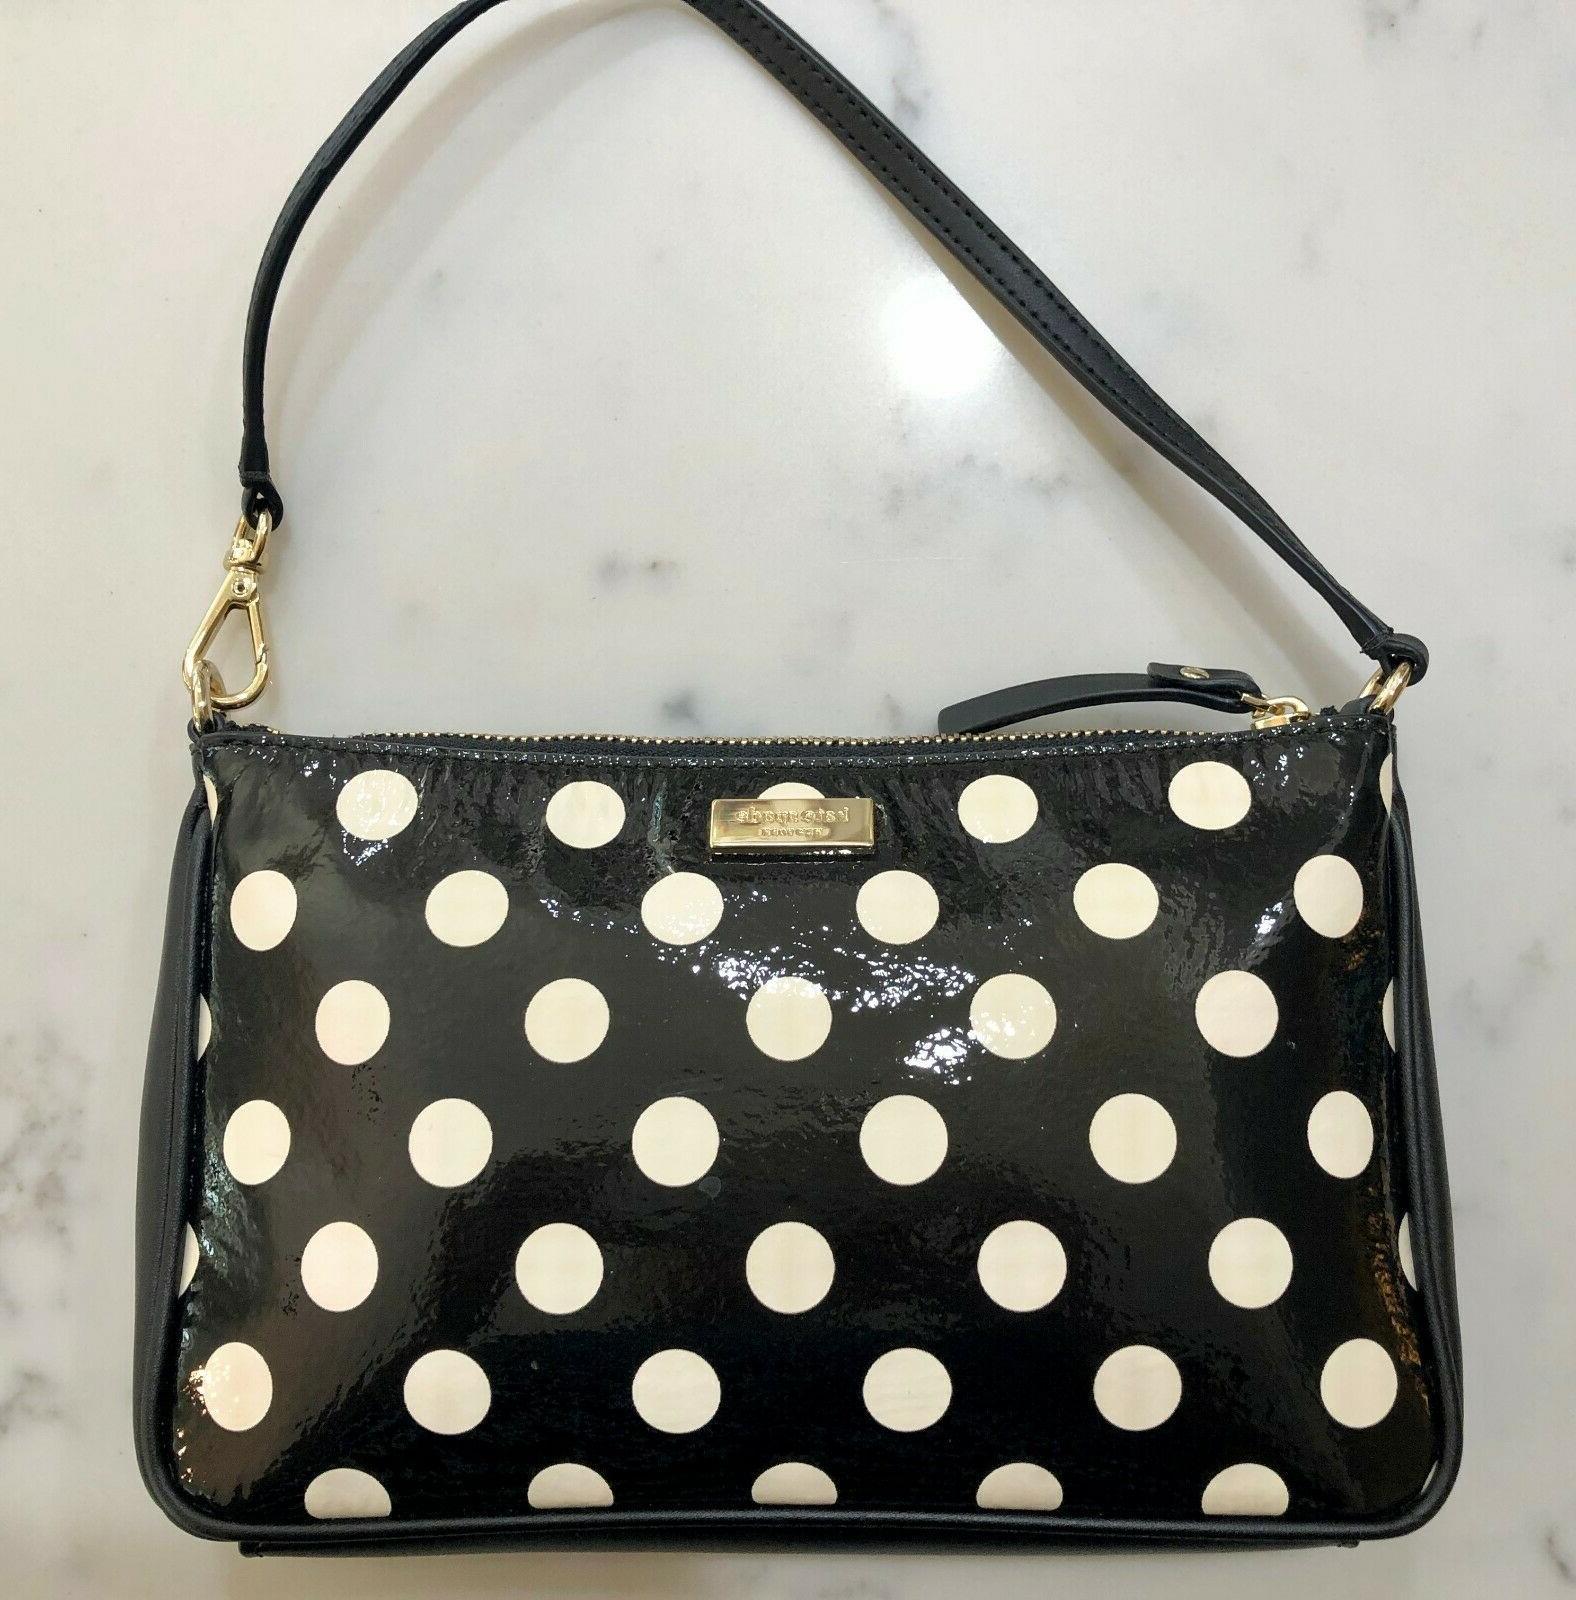 carlisle street serenade polka dot mini purse